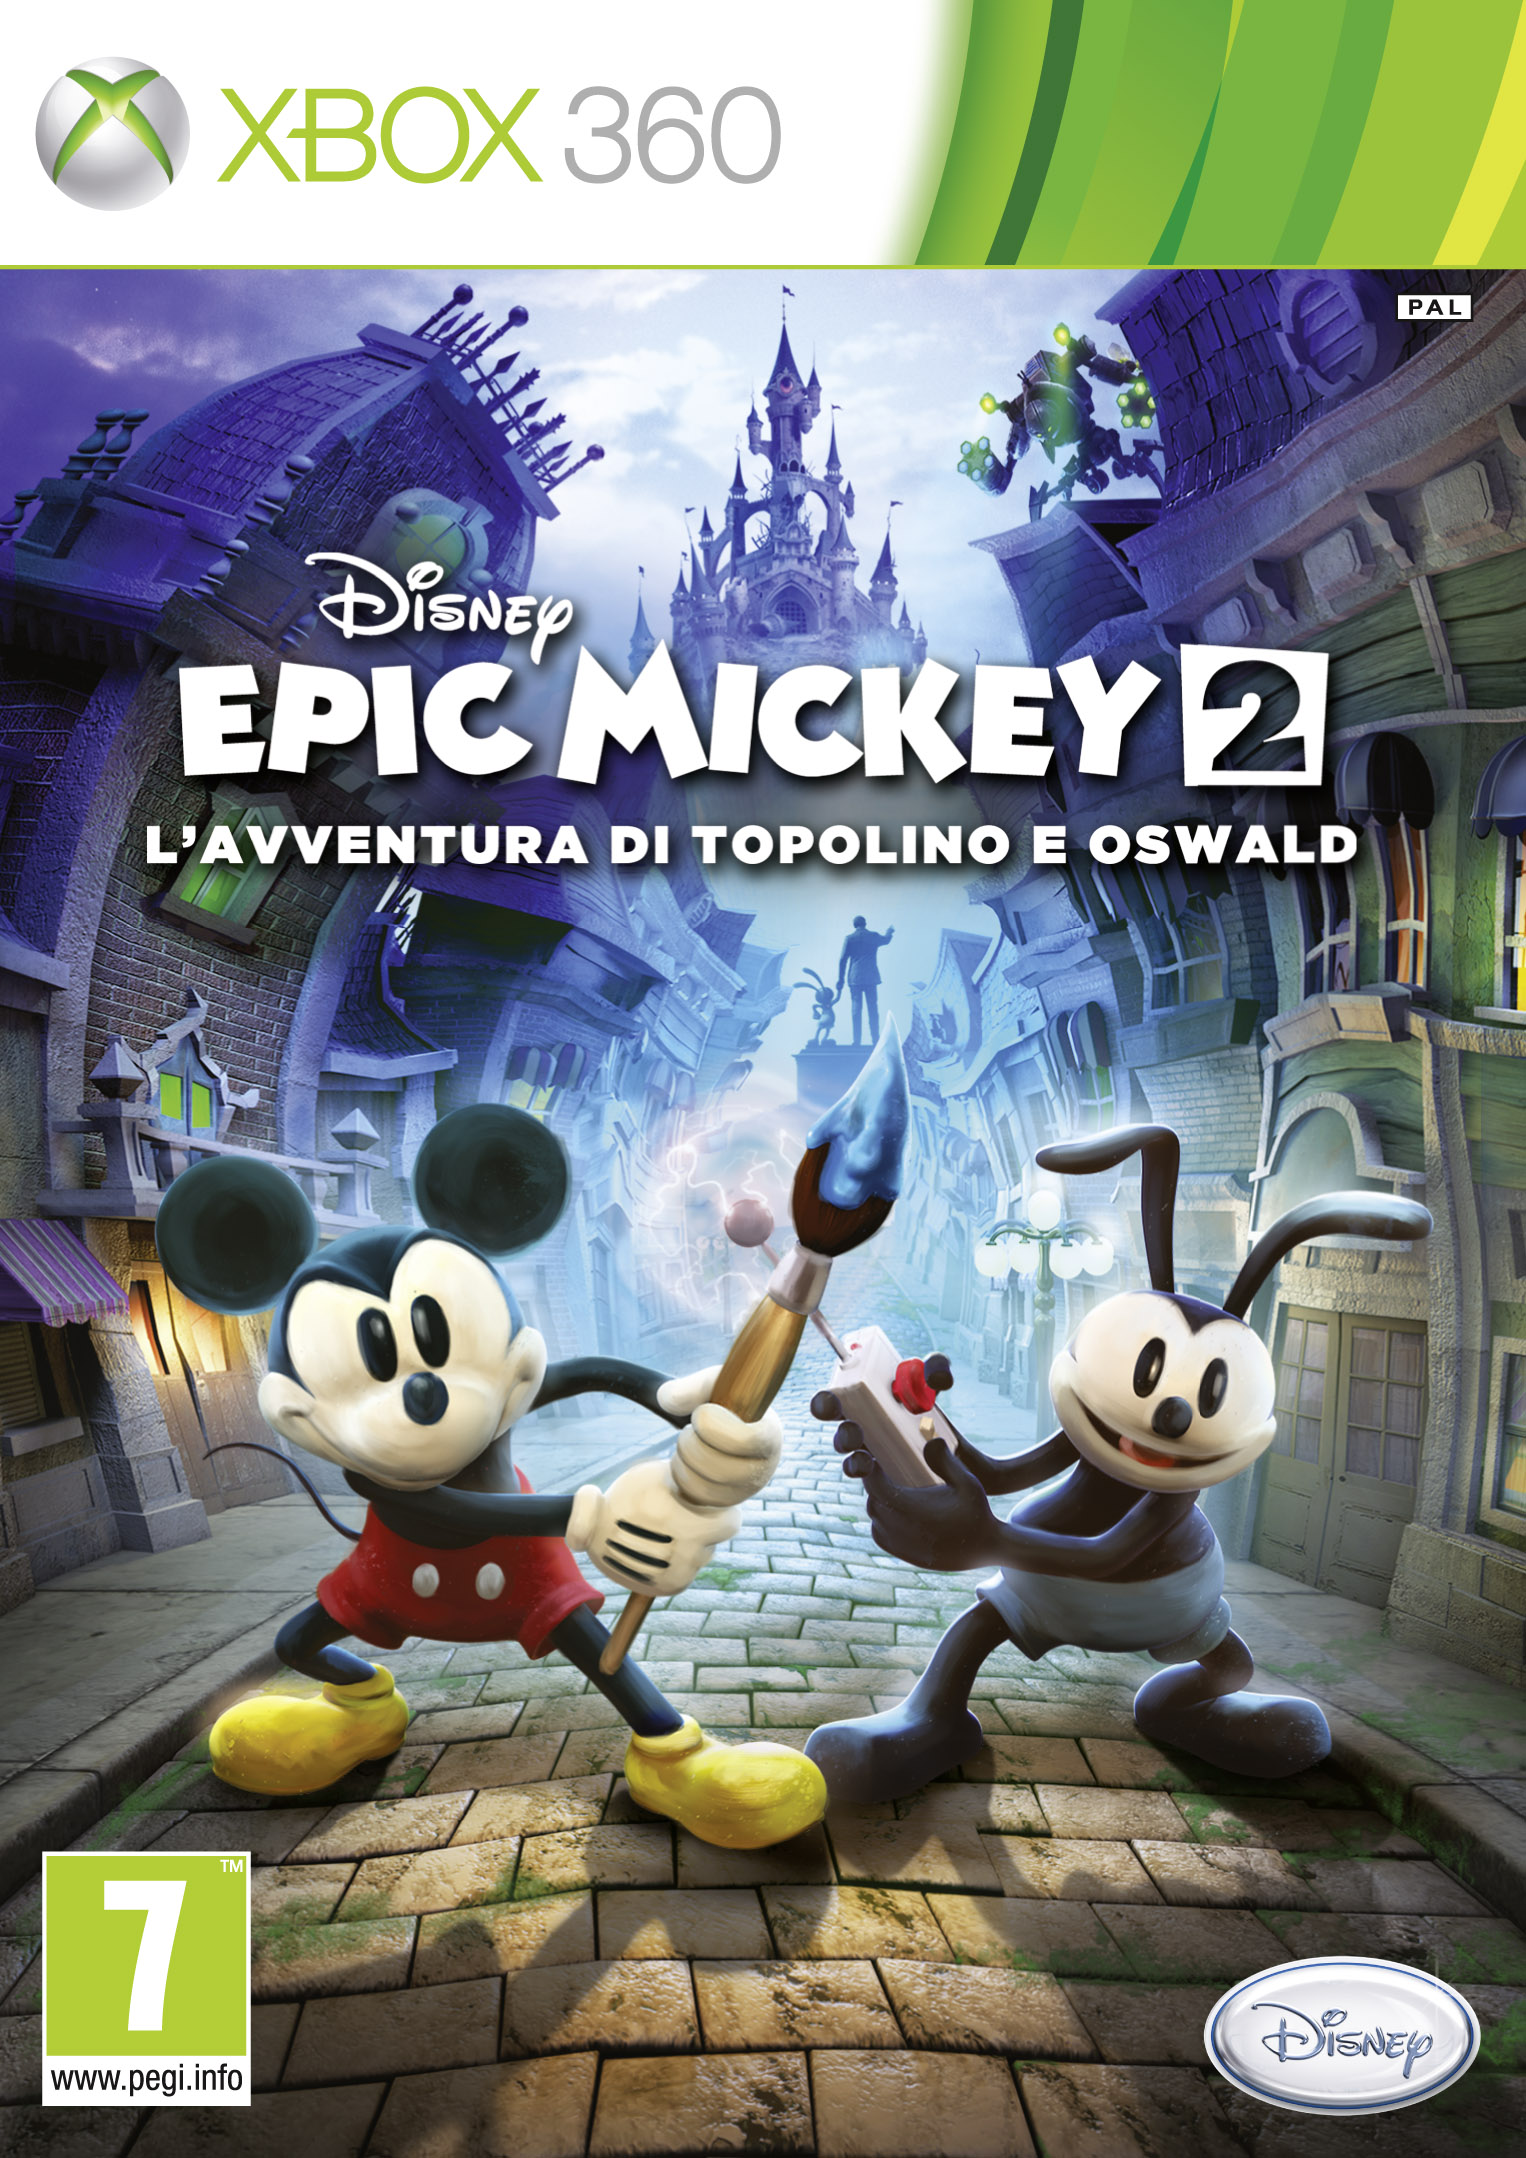 Epic Mickey 2 xbox